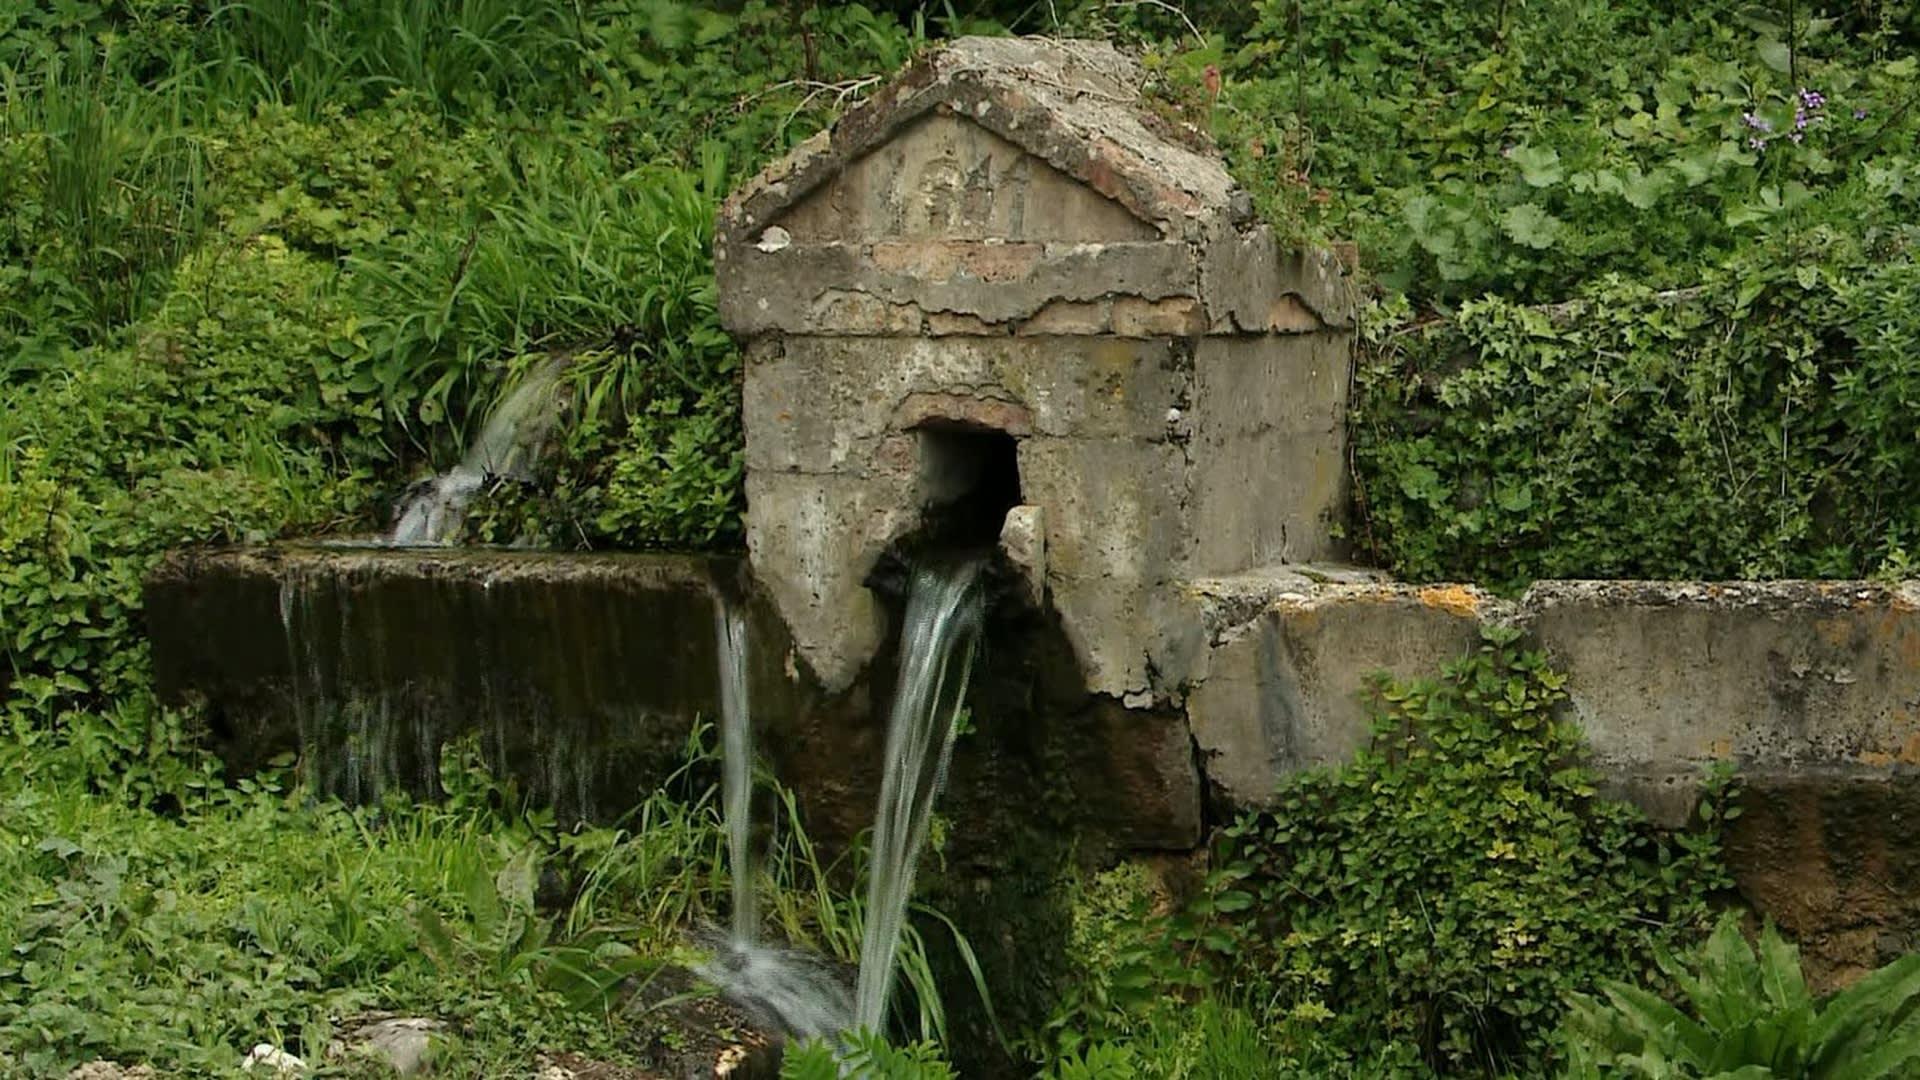 Detalle del sistema de irrigación de aguas en Konavle. (Foto: T.Rau)